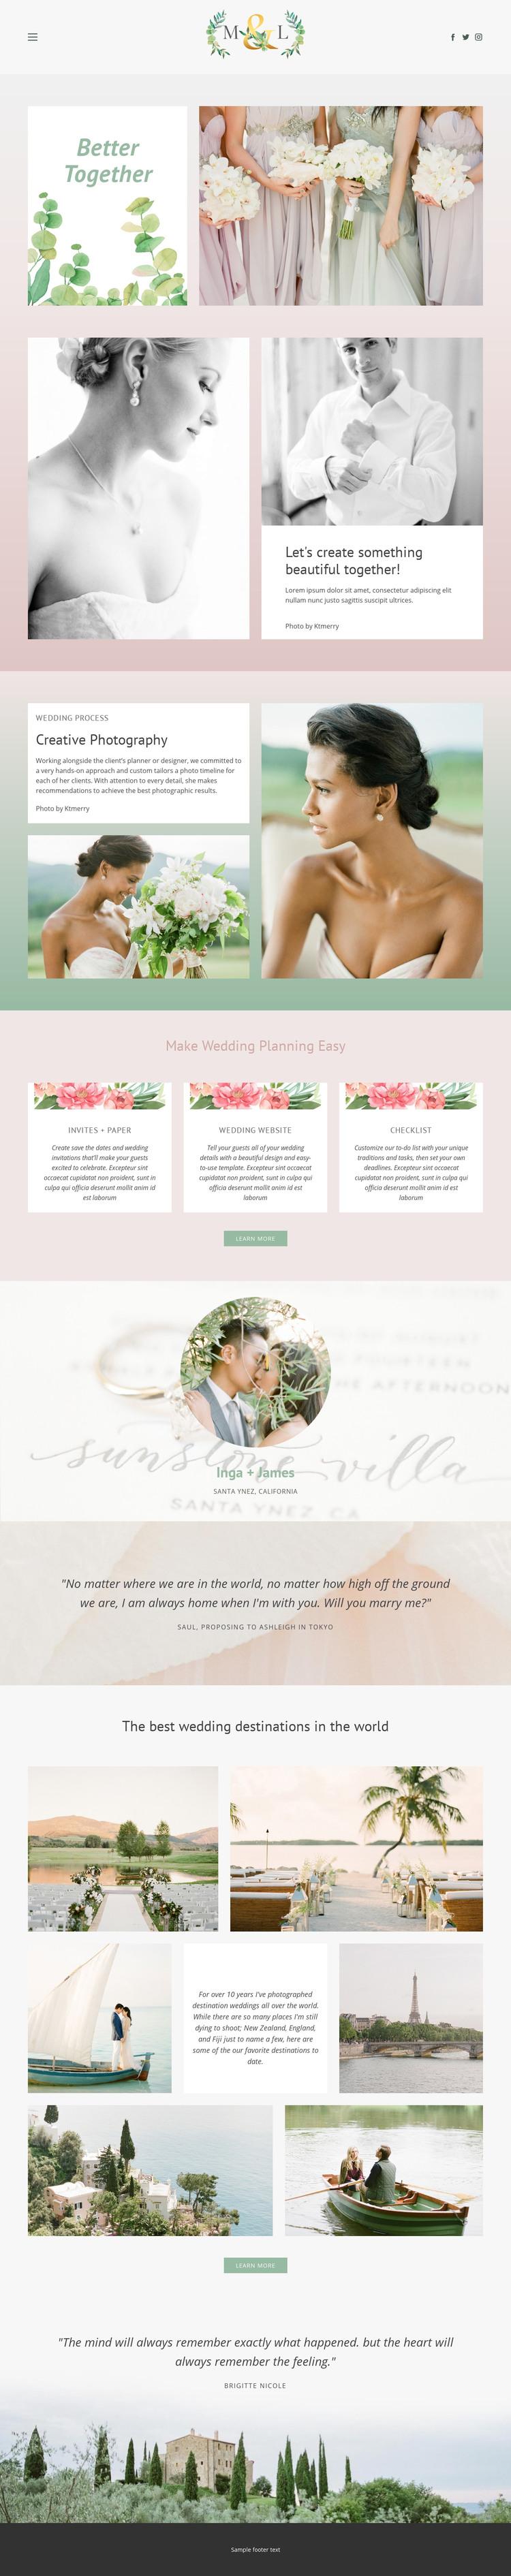 Best photos for wedding WordPress Website